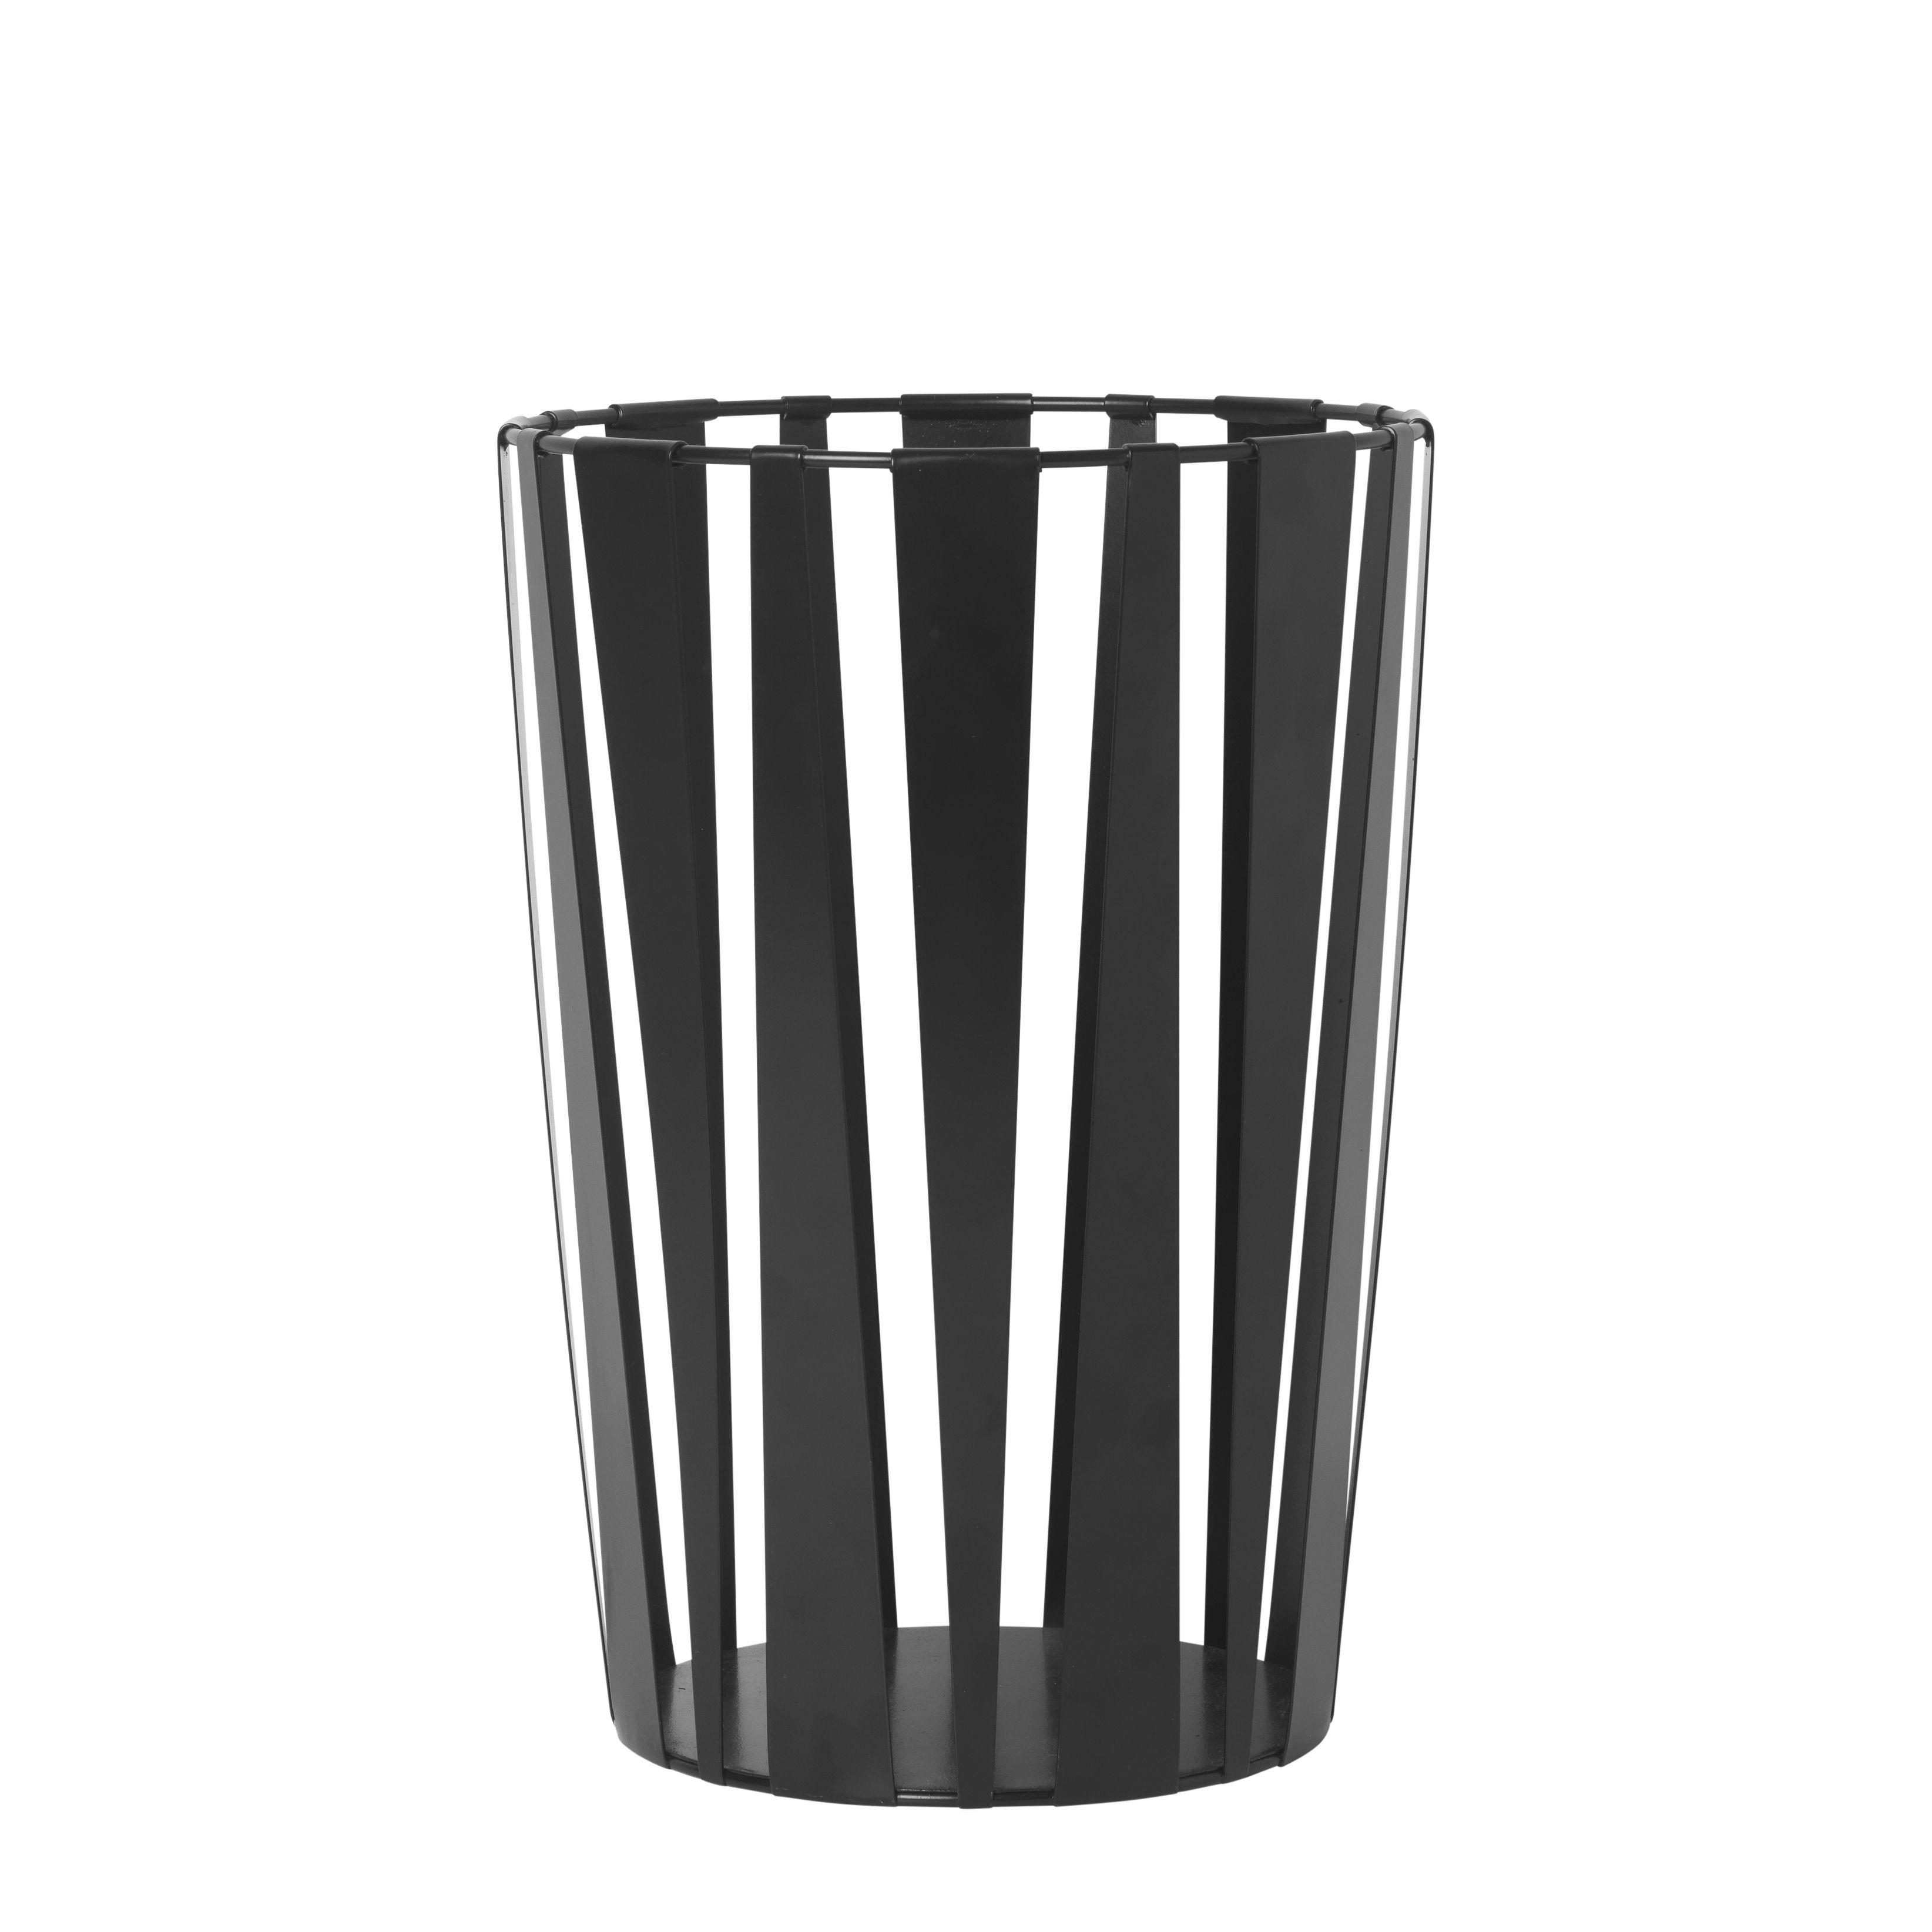 Accessories - Desk & Office Accessories - Rob Basket - / Wastepaper basket - Metal by Ferm Living - Black - Painted metal